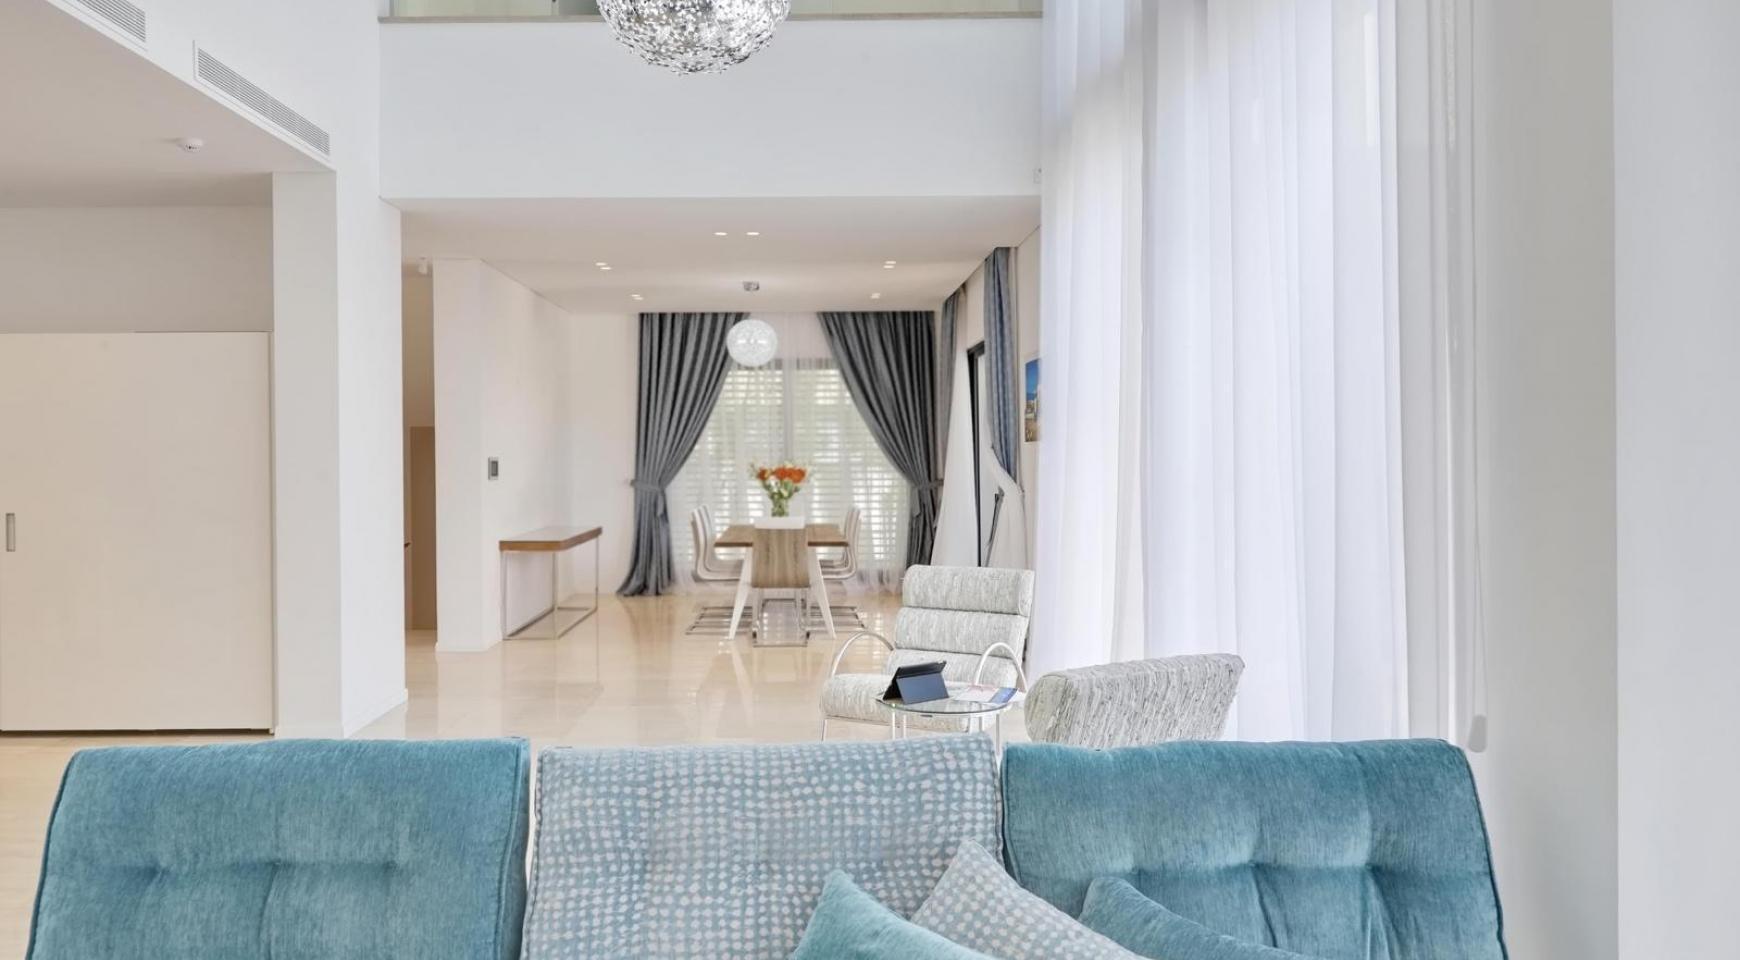 New Luxurious 4 Bedroom Villa in the Tourist Area - 16